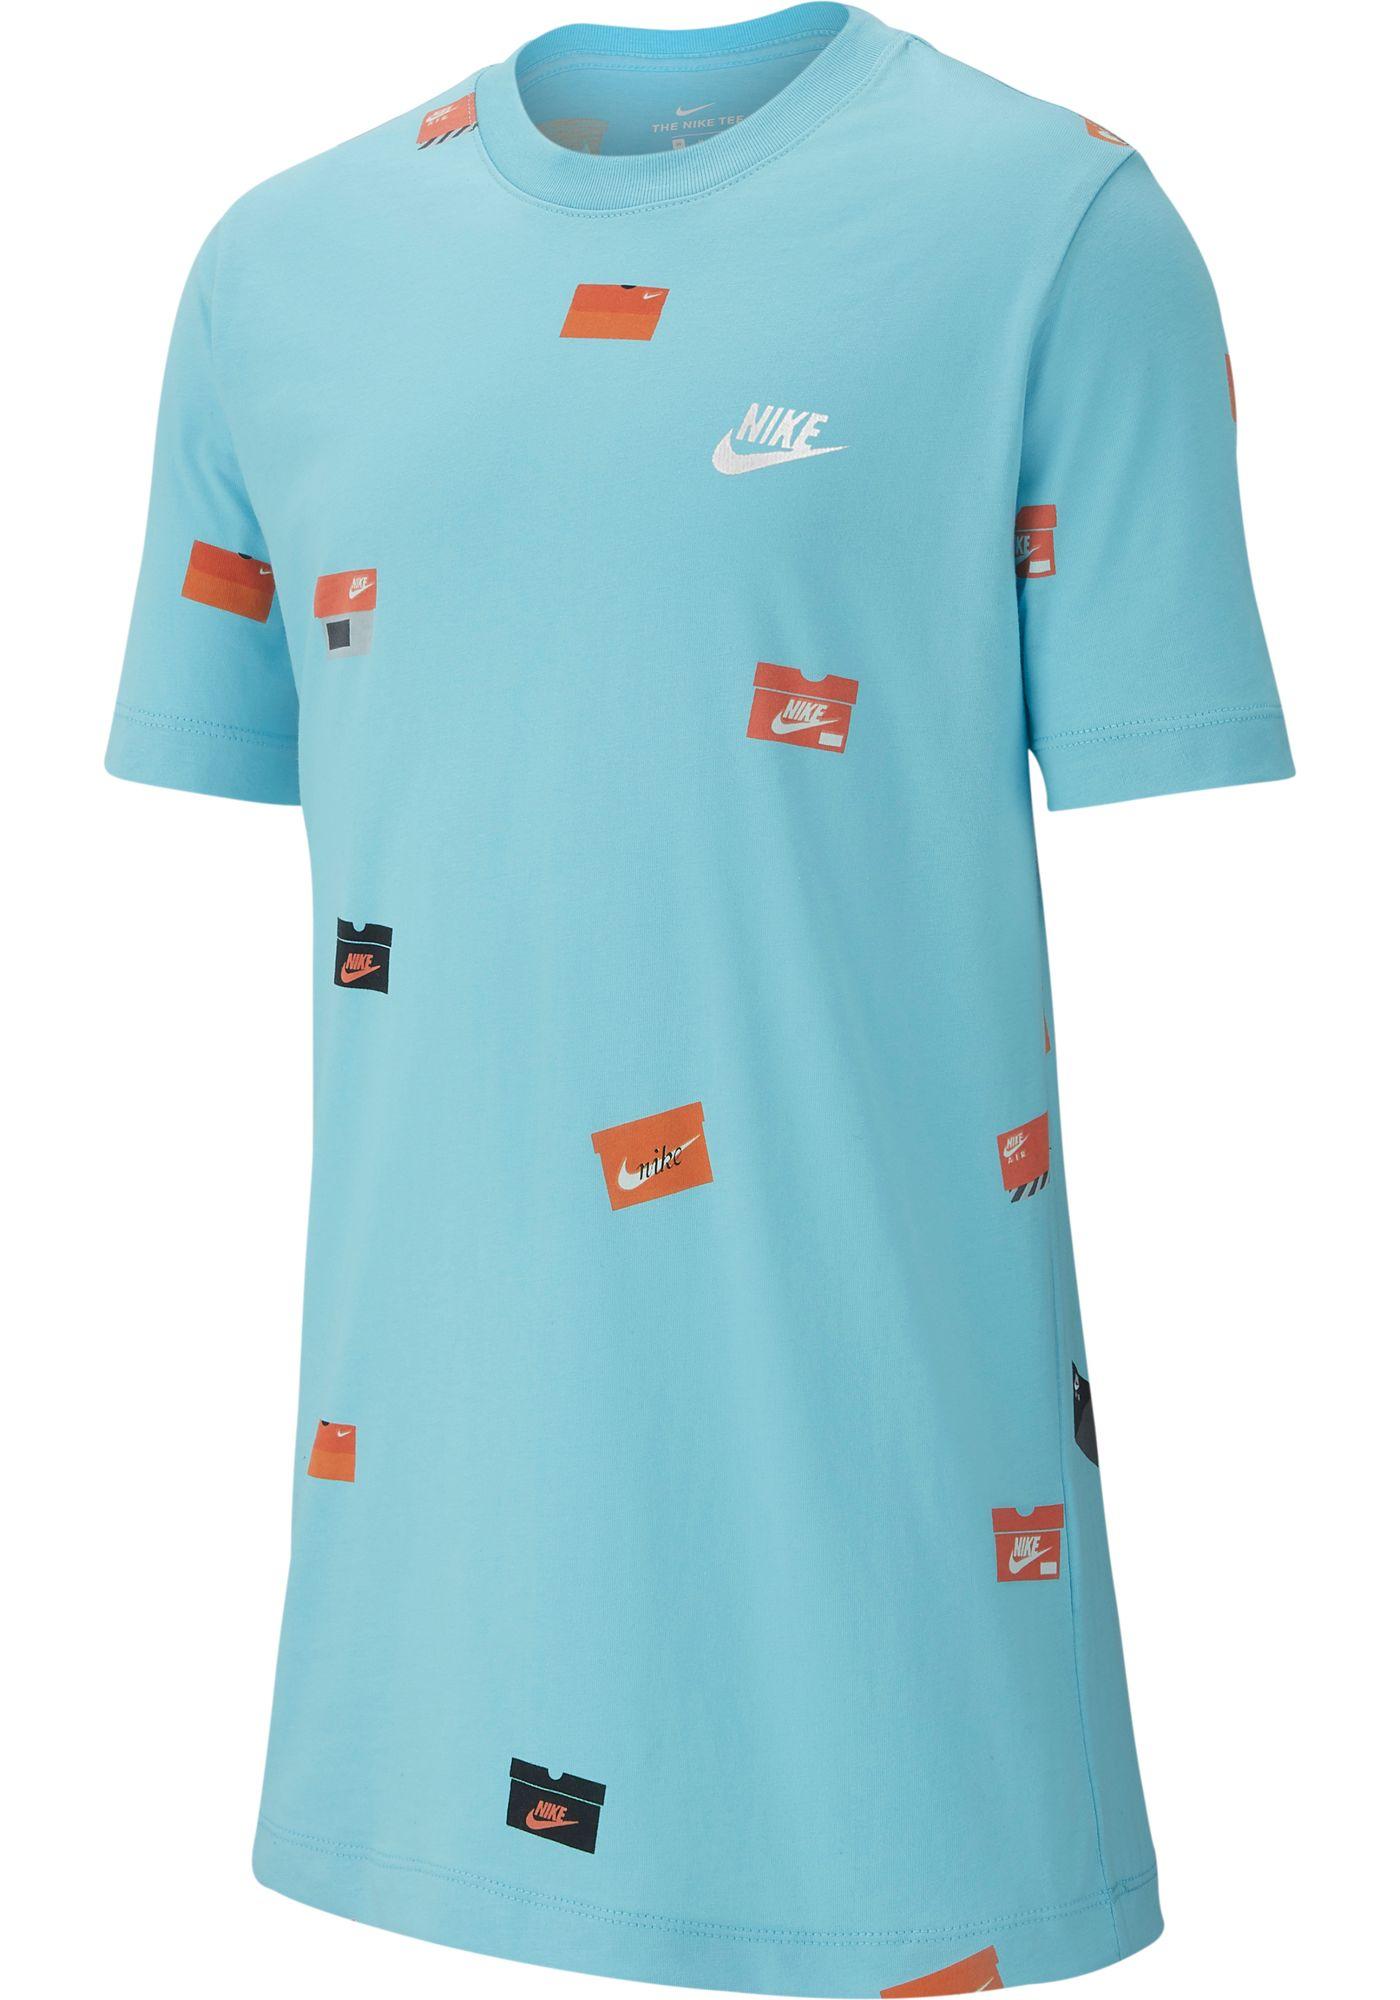 Nike Boys' Sportswear Allover Print Shoebox Graphic Tee